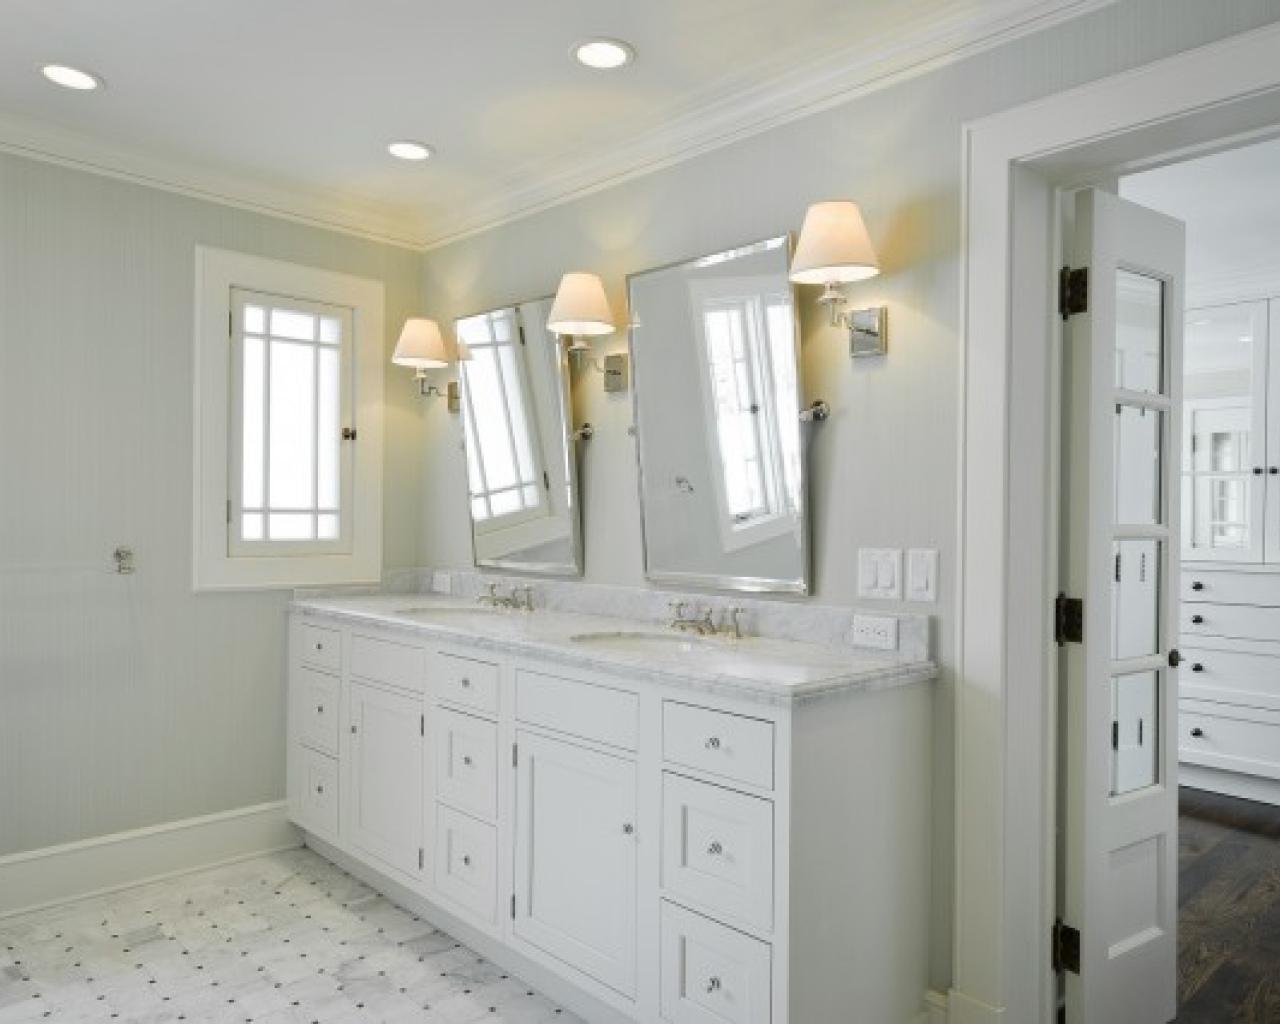 Pivoting Mirror Bathroom  20 Best Ideas Pivot Mirrors for Bathroom